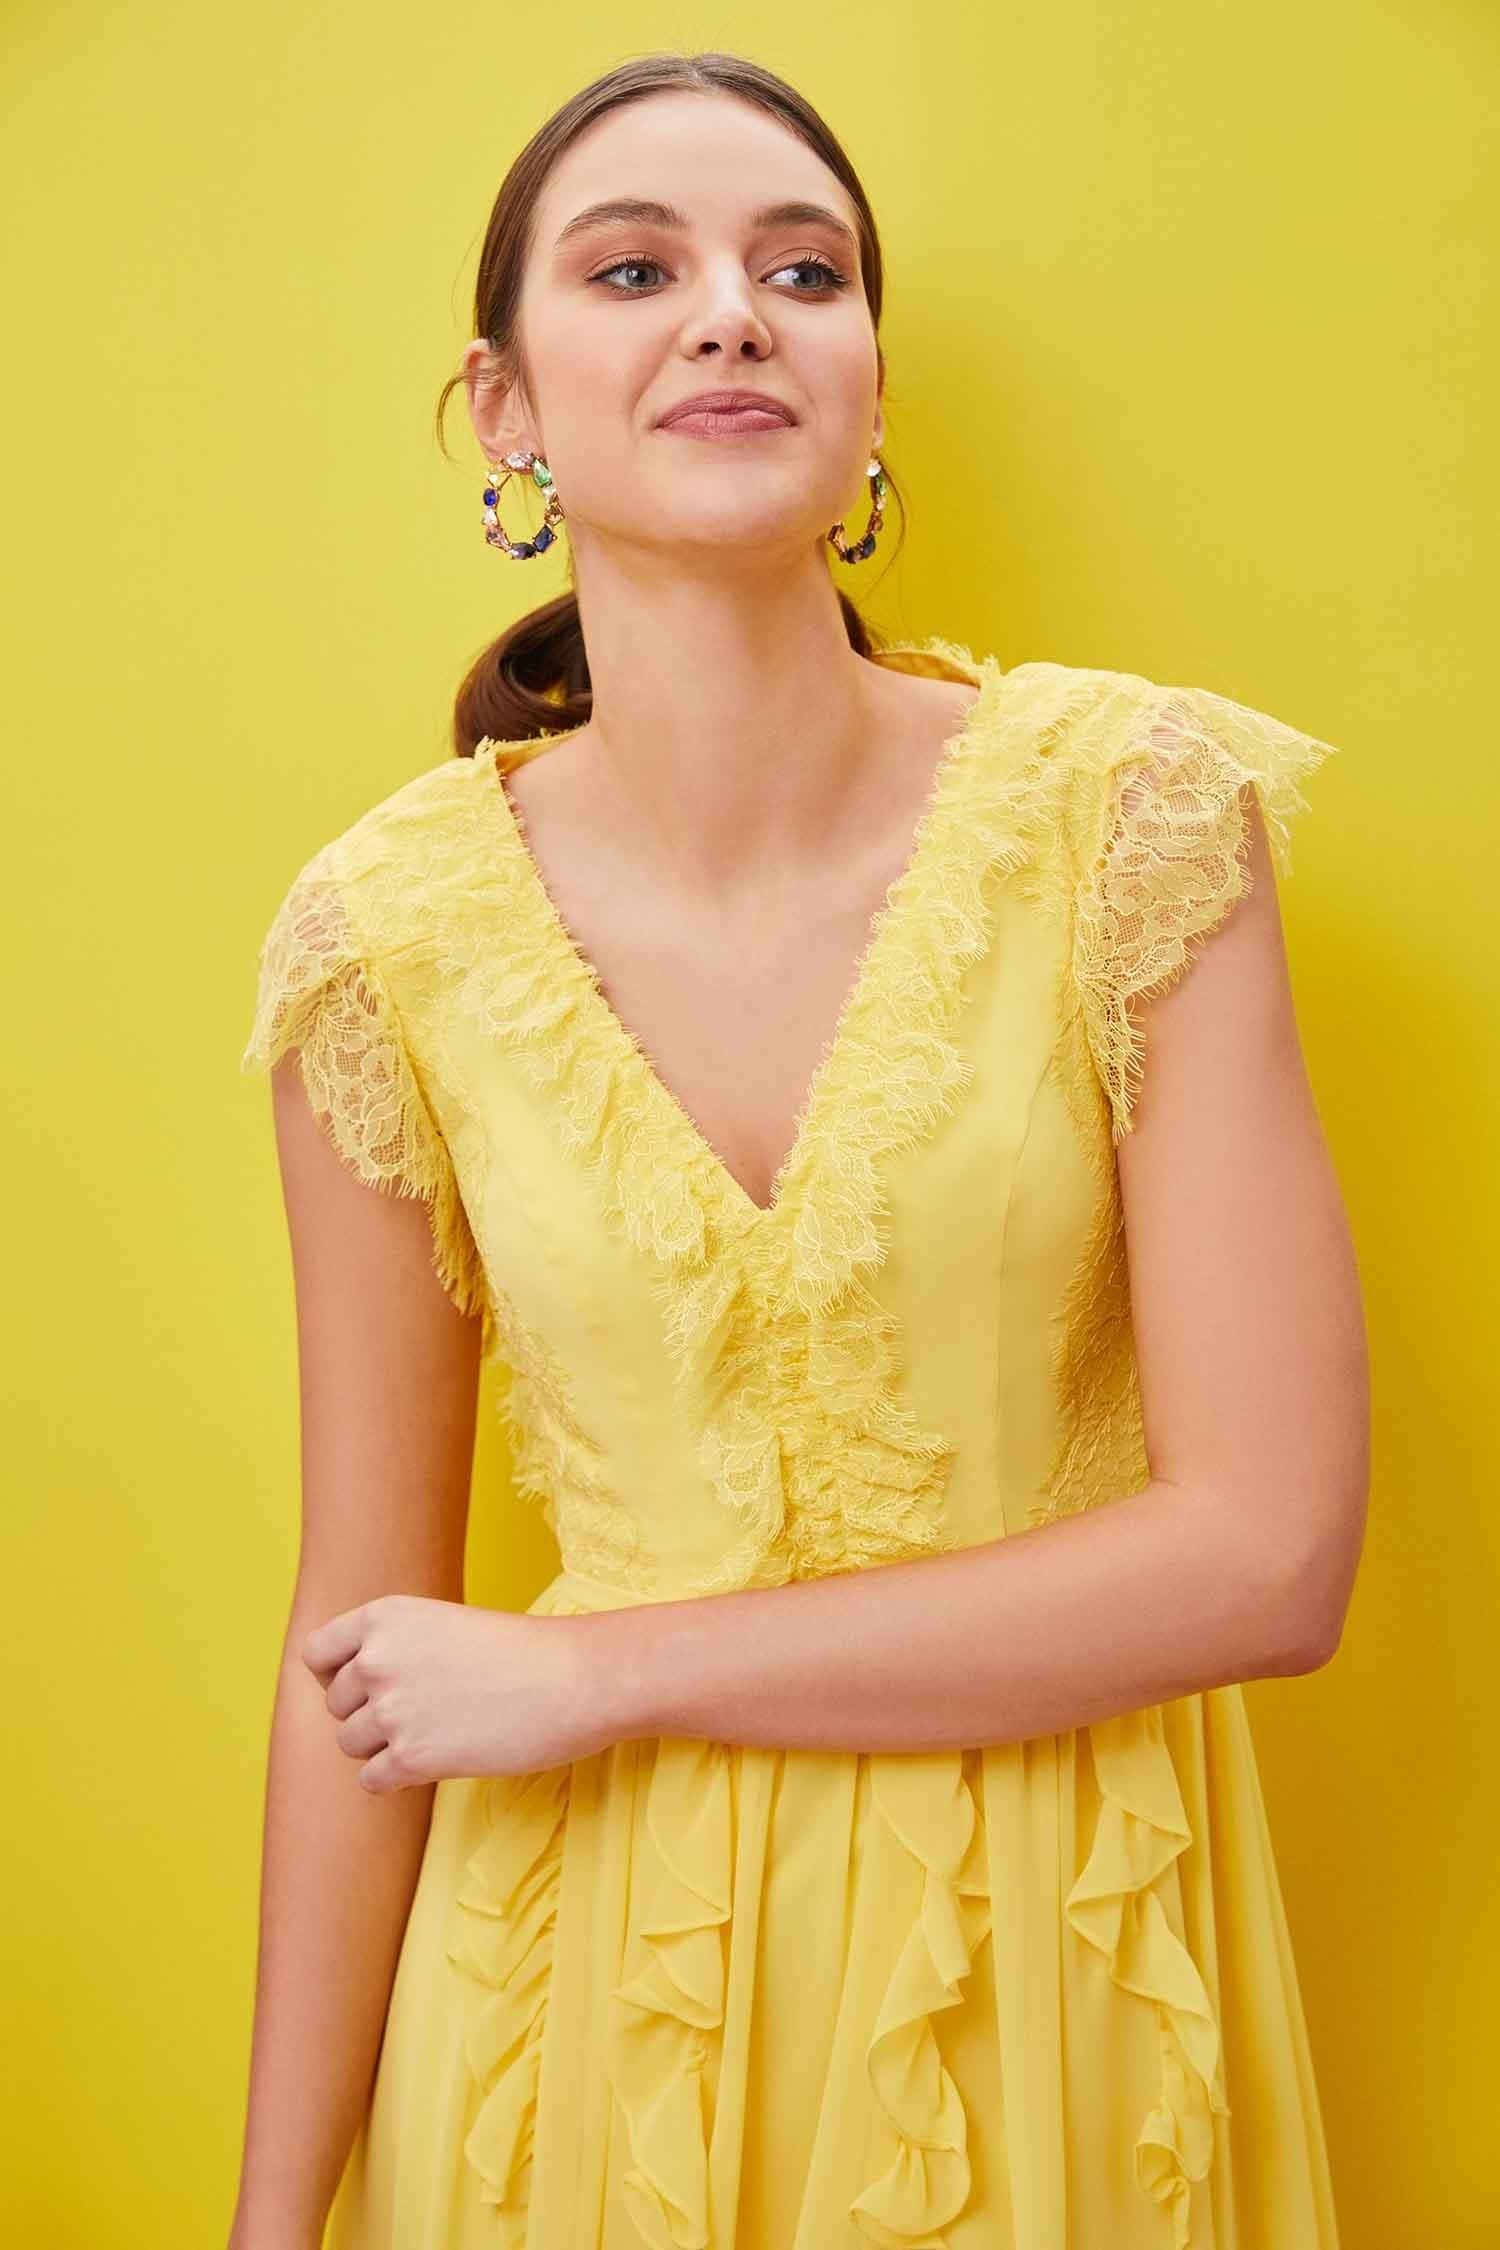 Sarı Kap Kol V Yaka Şifon Uzun Elbise - Thumbnail